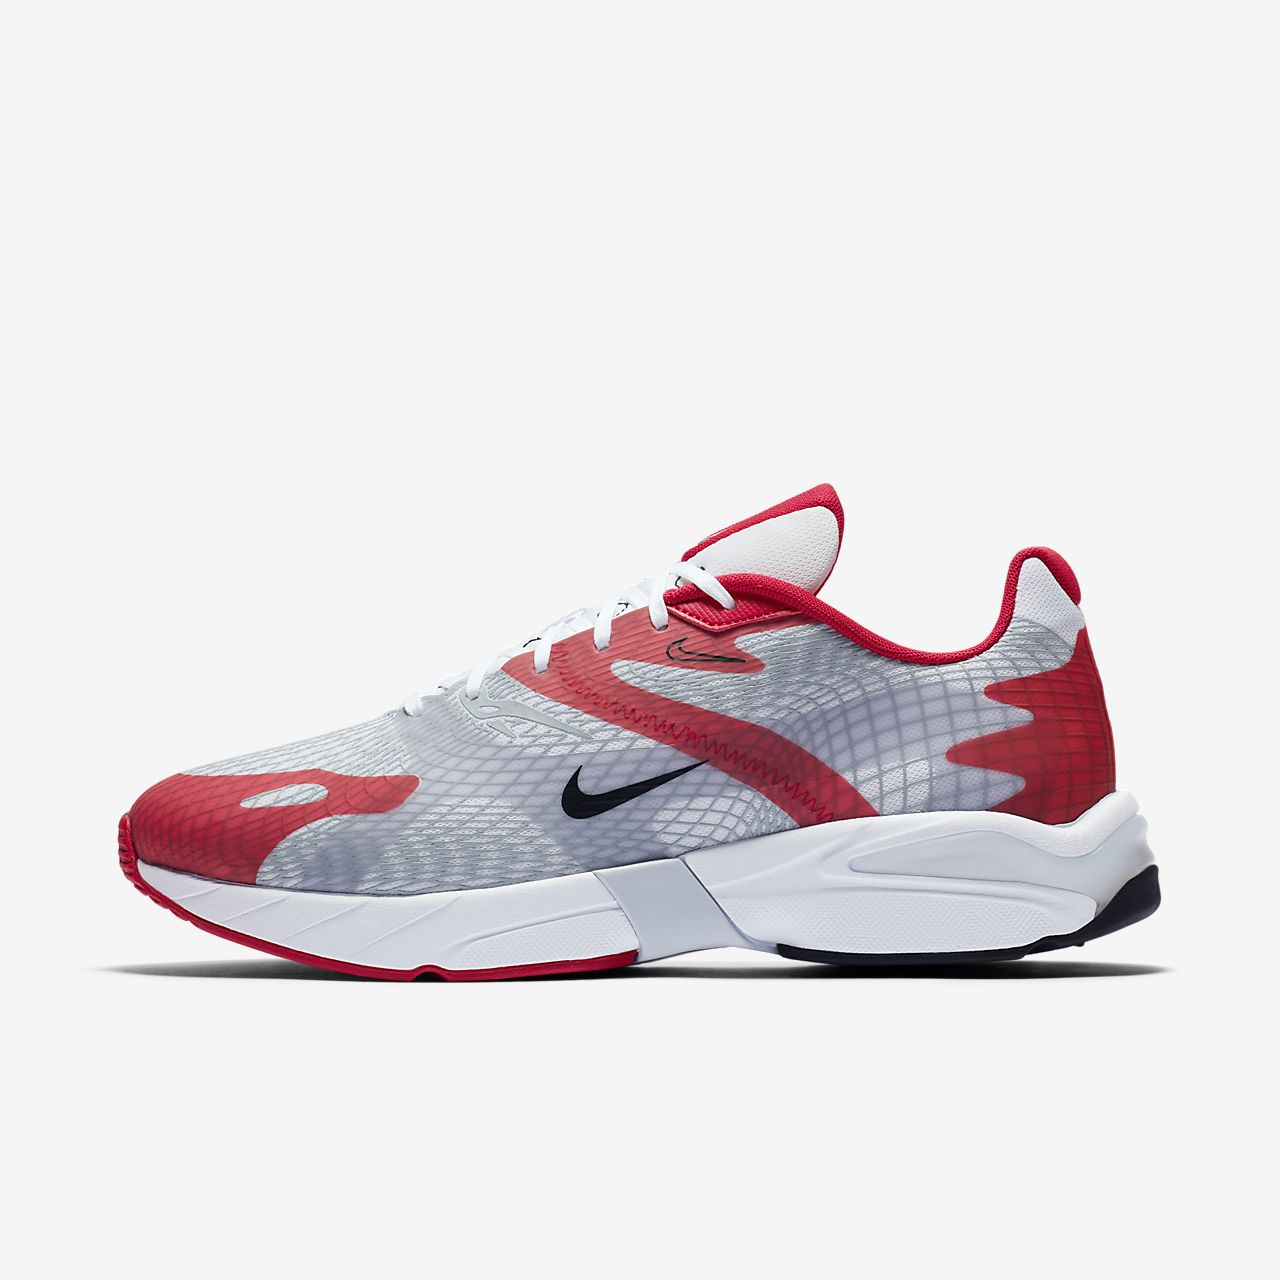 NIKE Air Force 1 Turnschuhe Sneaker Schuhe, Größe:42